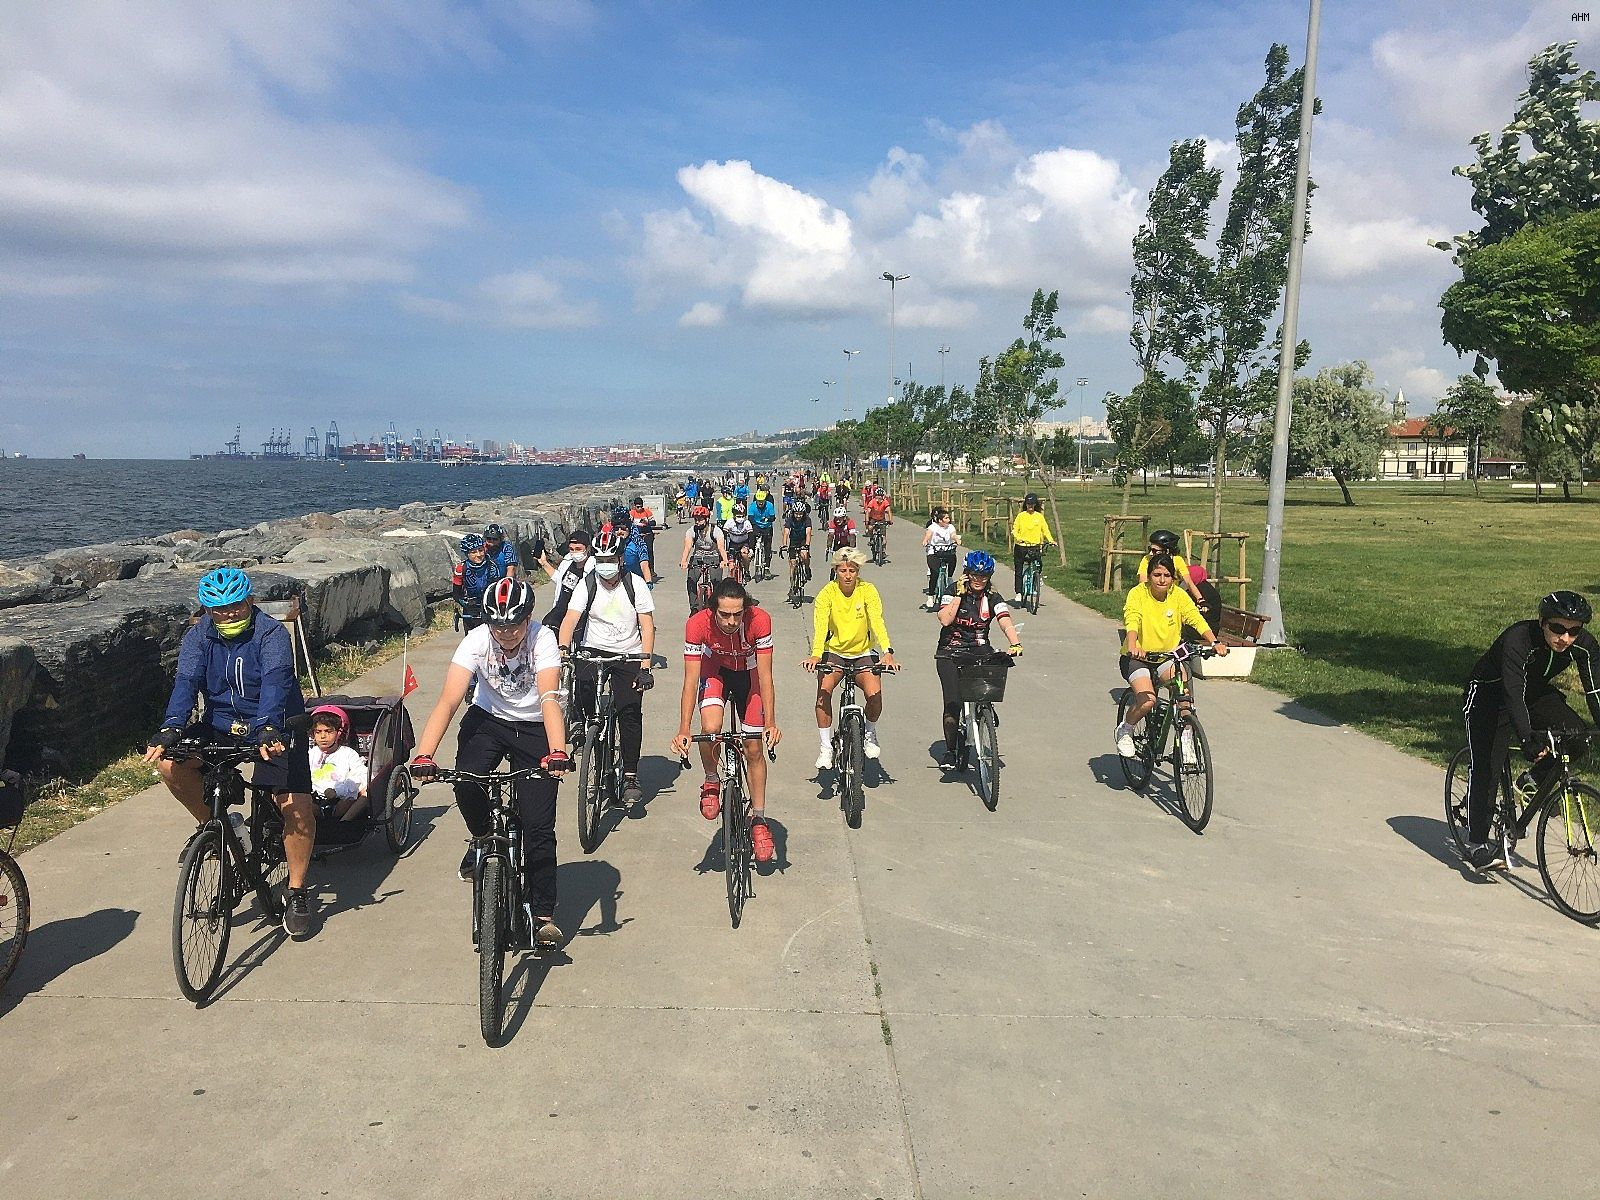 2021/06/avcilarda-bisikletseverler-dunya-bisiklet-gunu-icin-pedal-cevirdi-20210603AW33-3.jpg